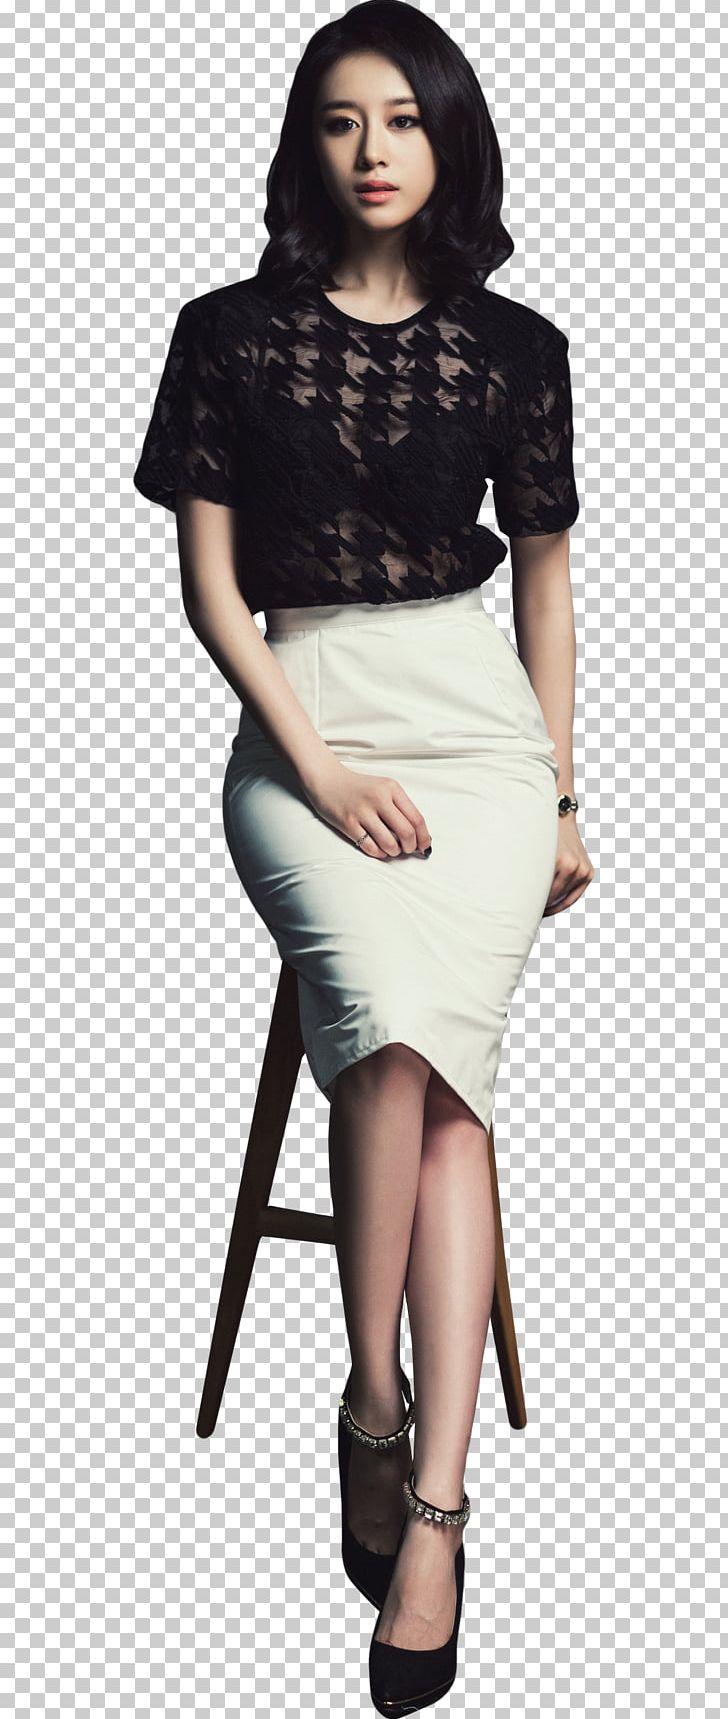 Park Ji-yeon Artist Model PNG, Clipart, Art, Artist, Deviantart, Digital Art, Fashion Free PNG Download